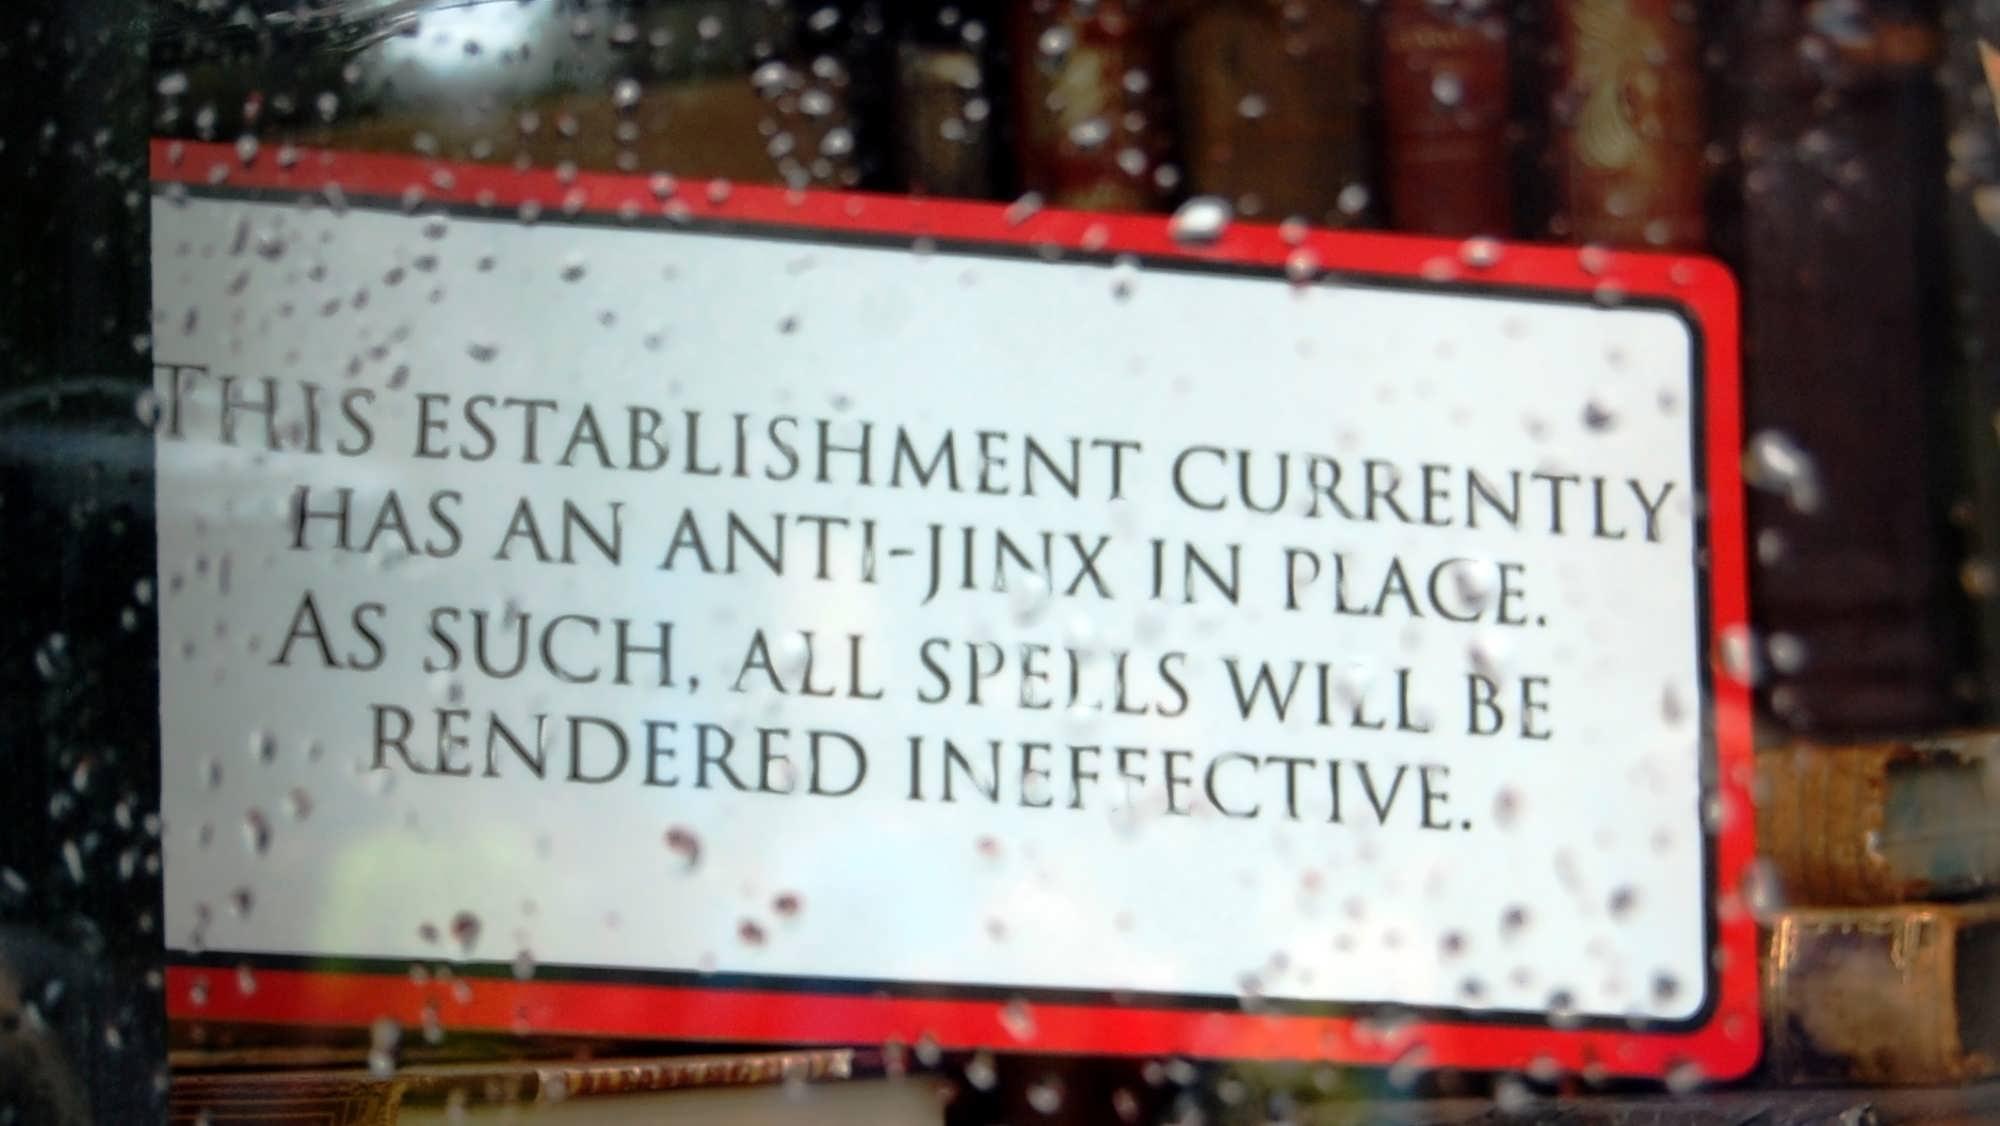 An anti-jinx sign.